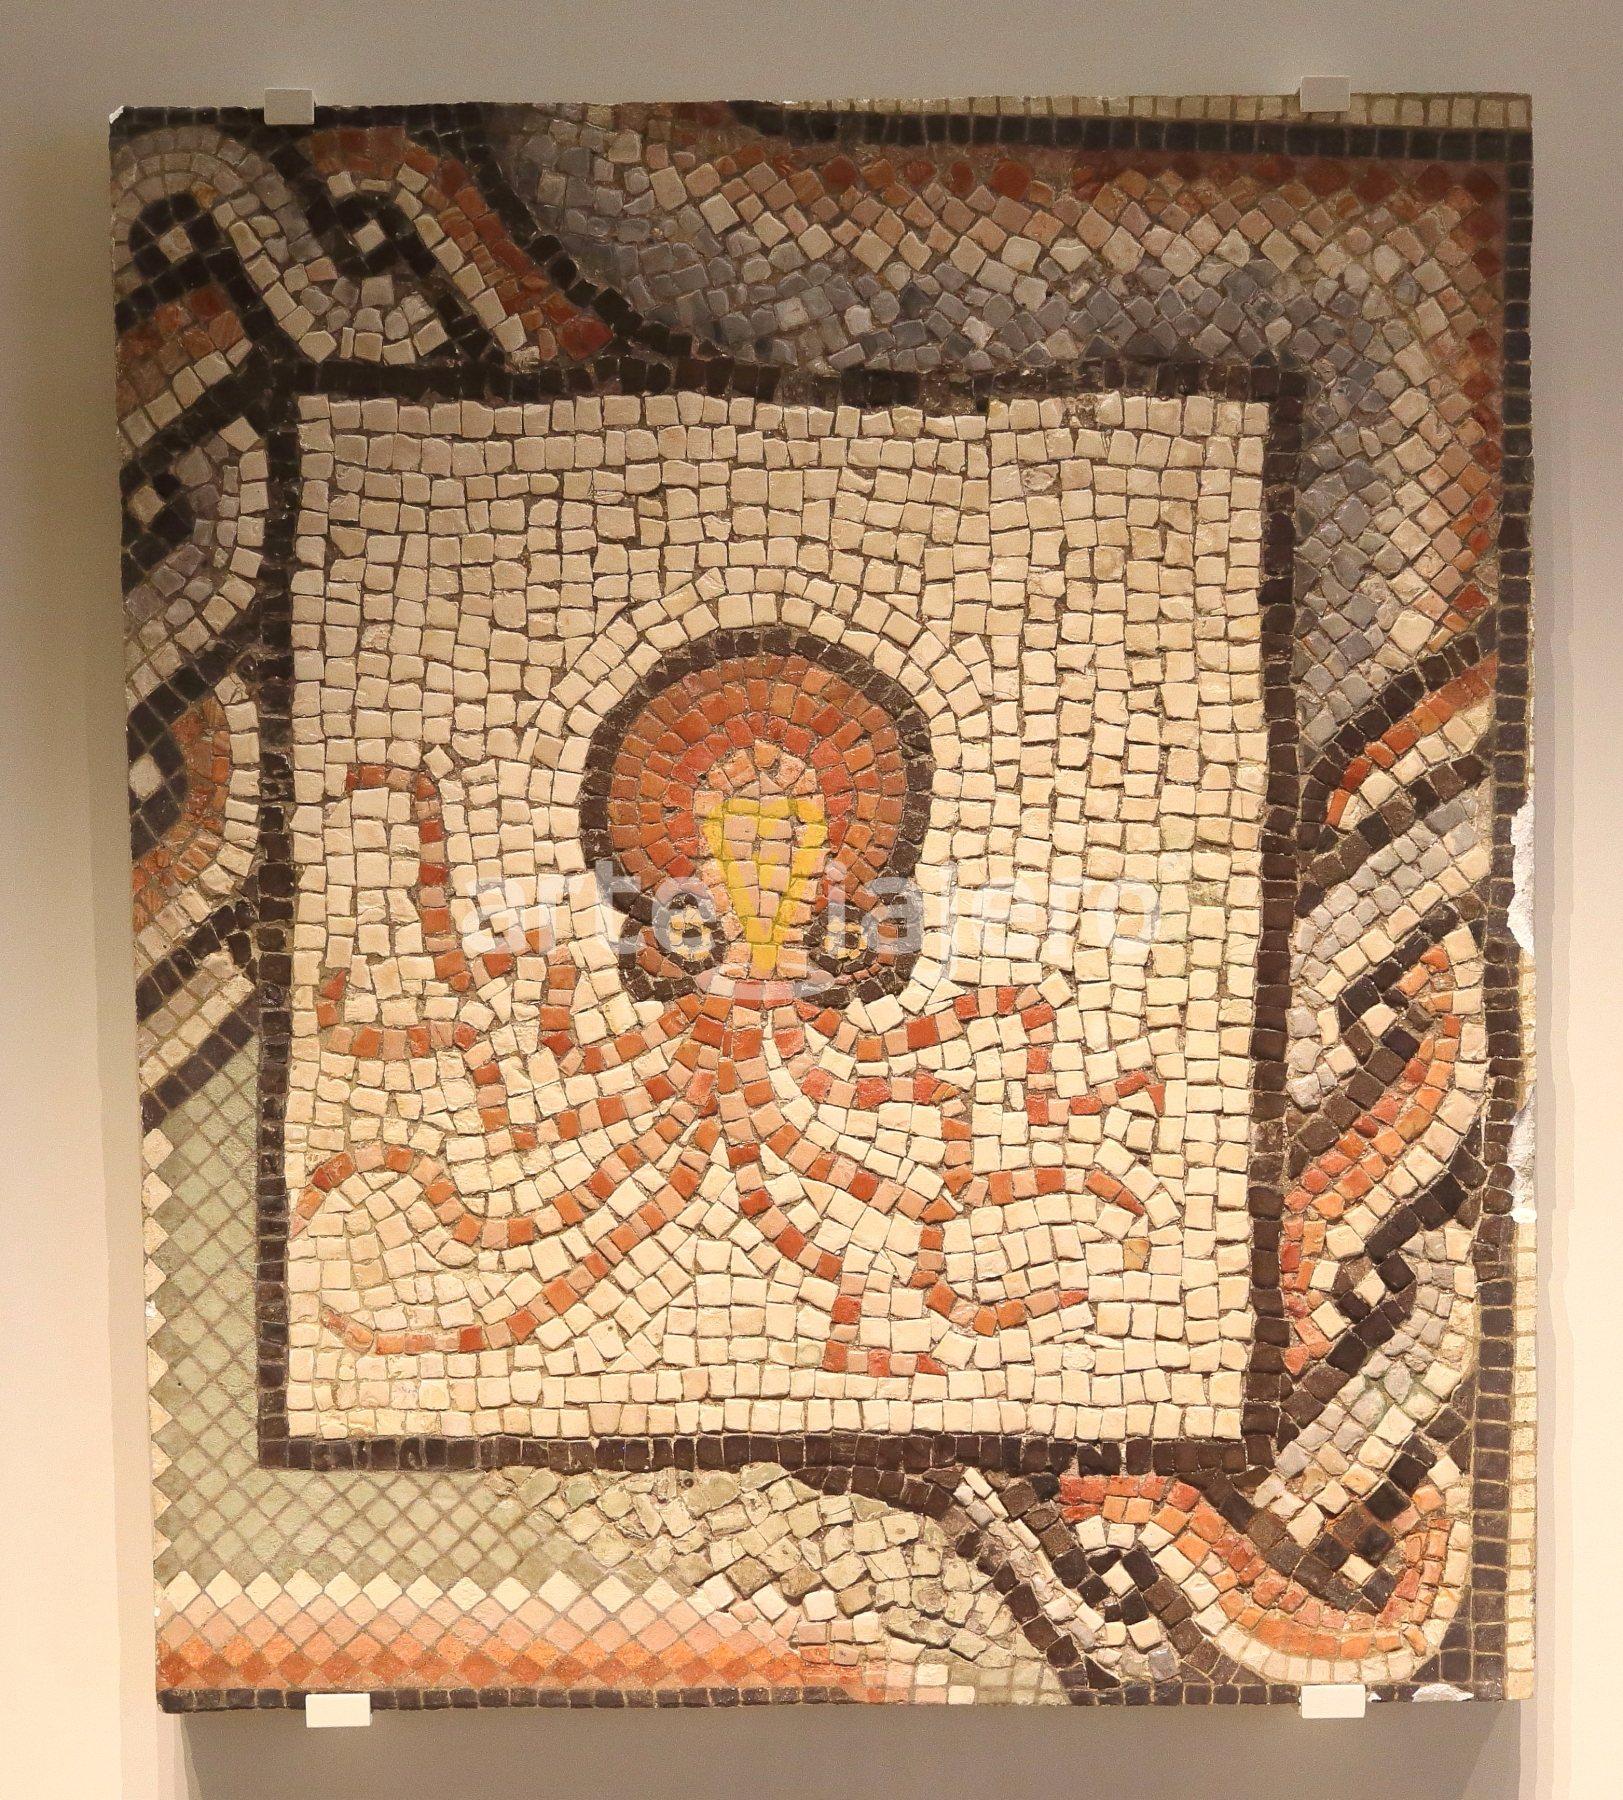 mosaico romano con pulpo